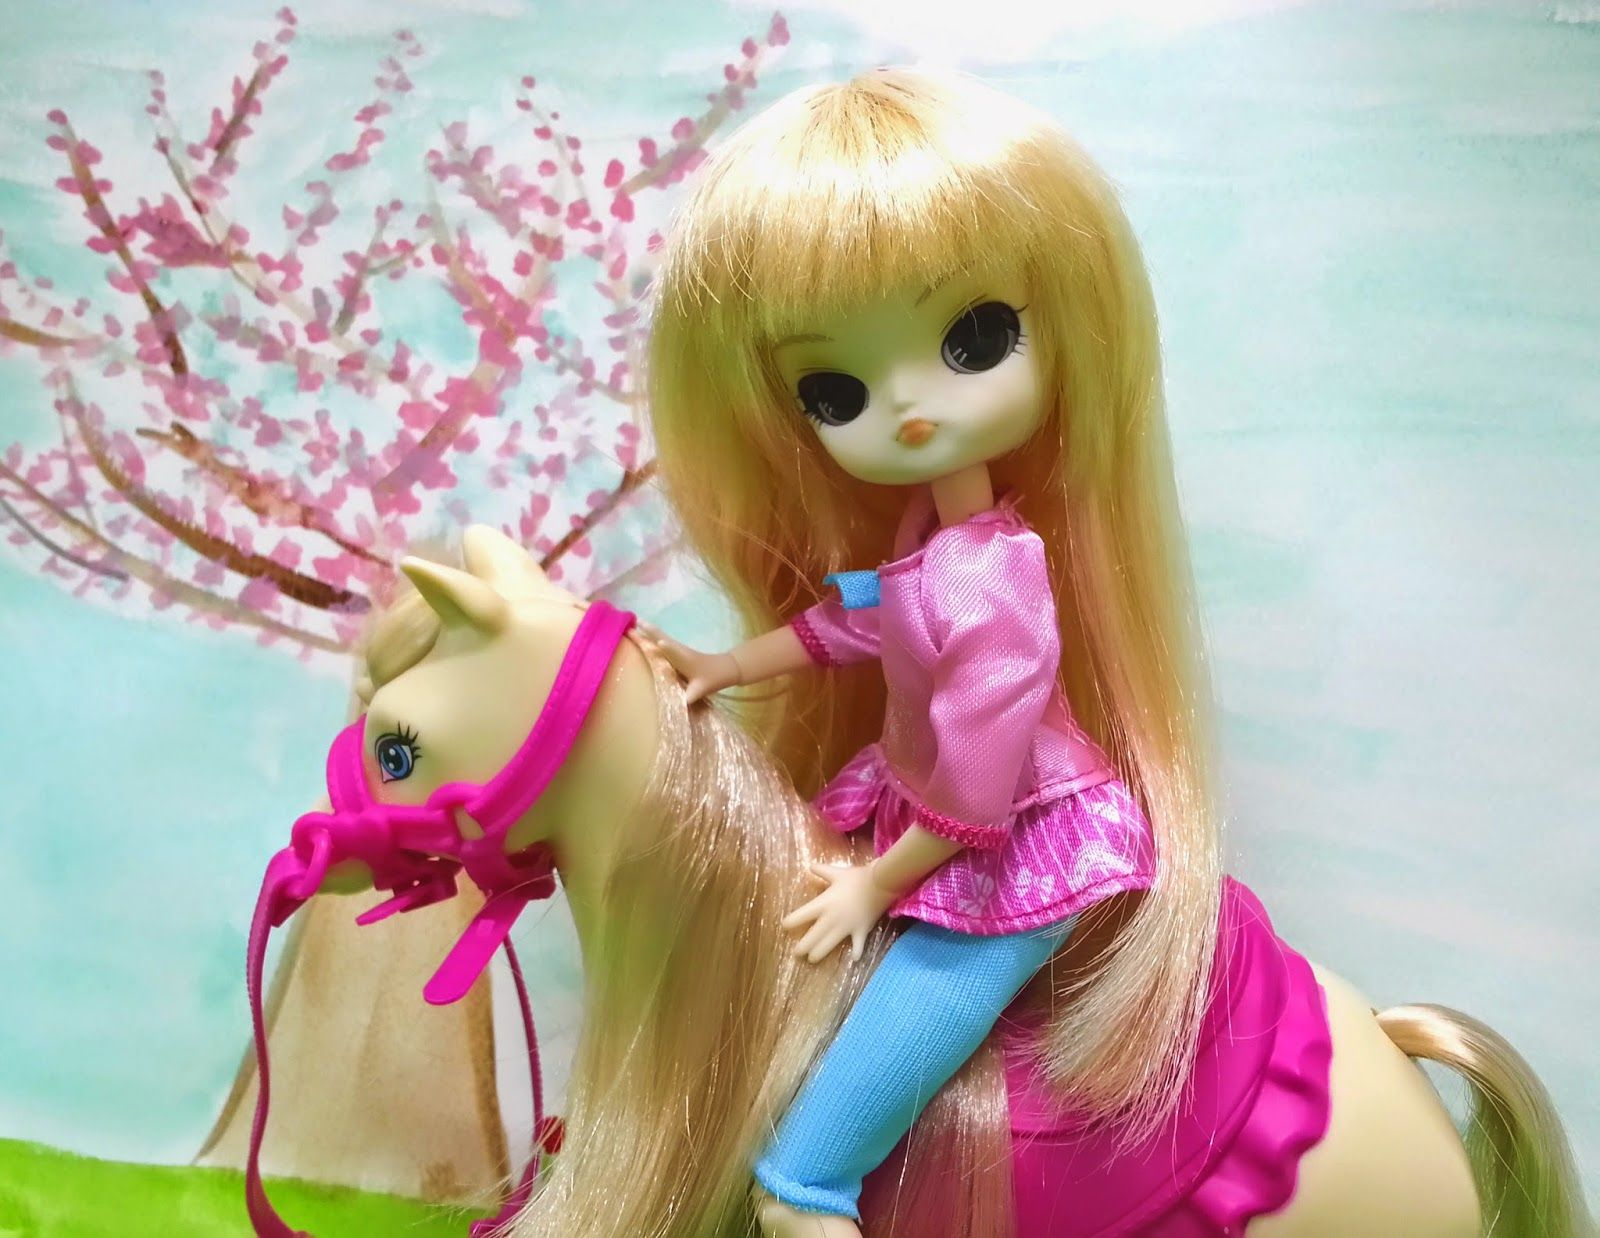 Barbie Mobili ~ Innocent barbie doll wallpapersu2026 barbie doll wallpapers